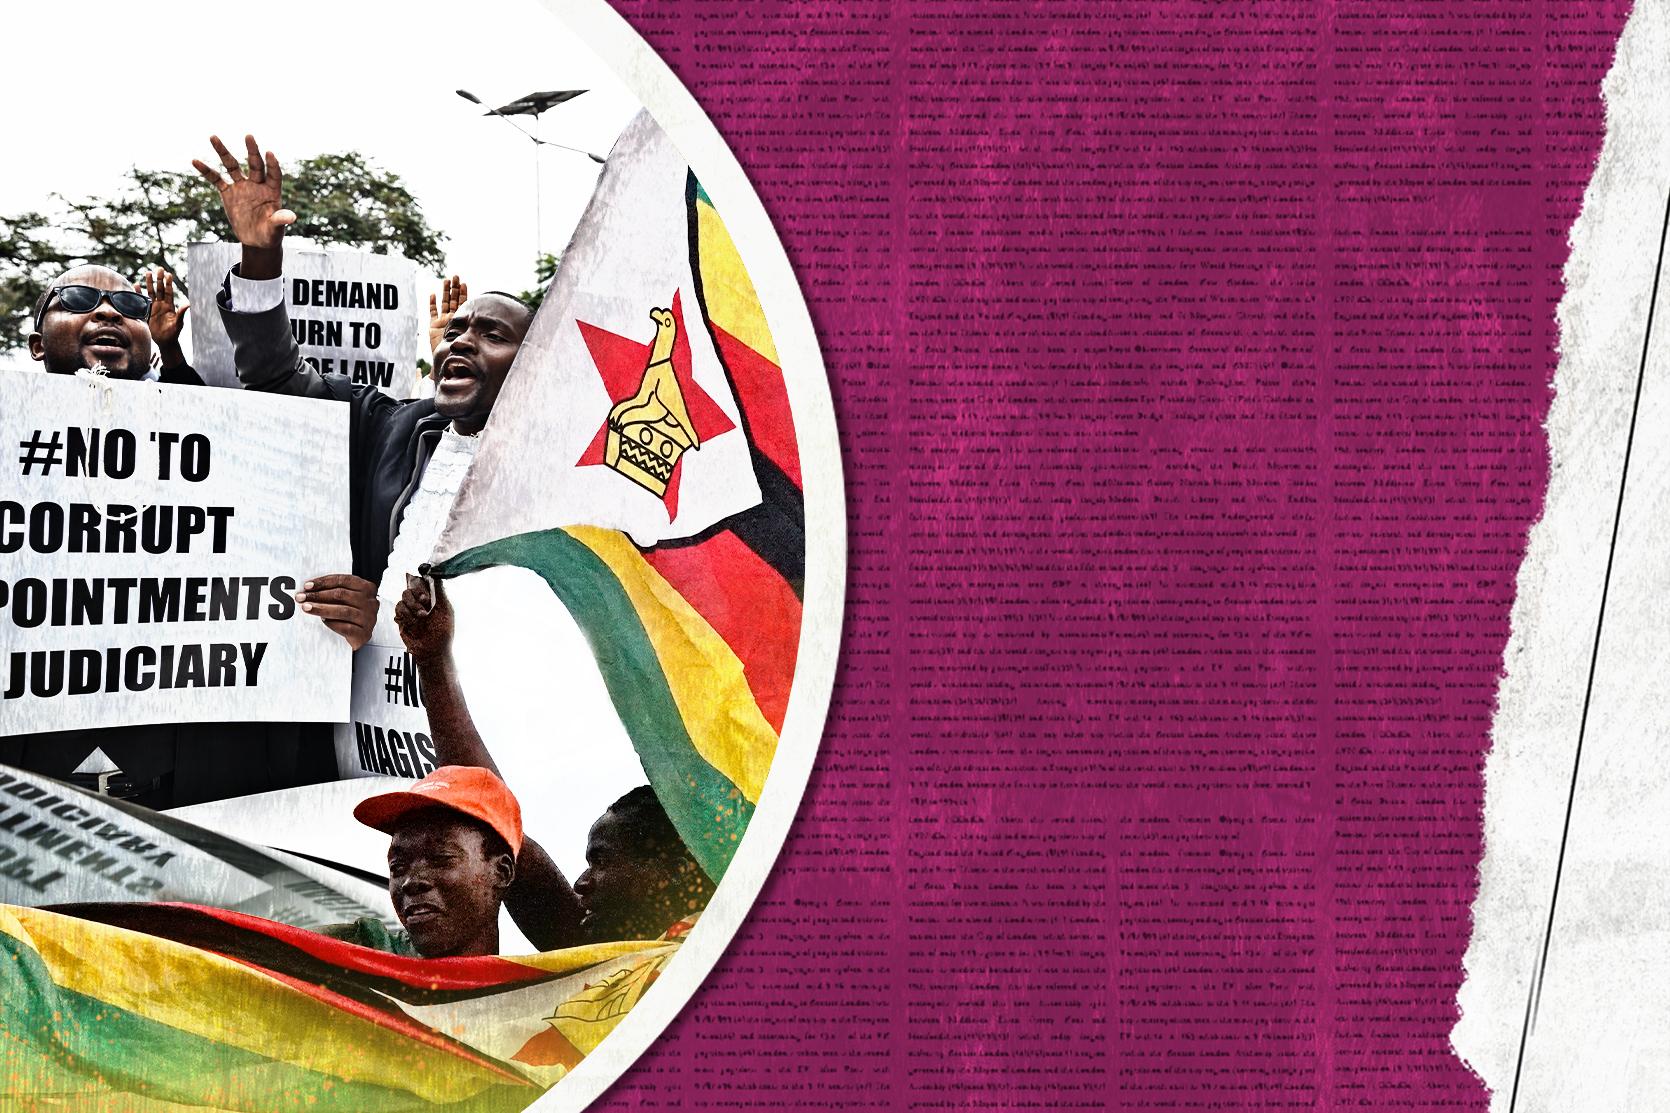 Zimbabwe's autocratic legitimation and the citizen struggle in safeguarding the constitution